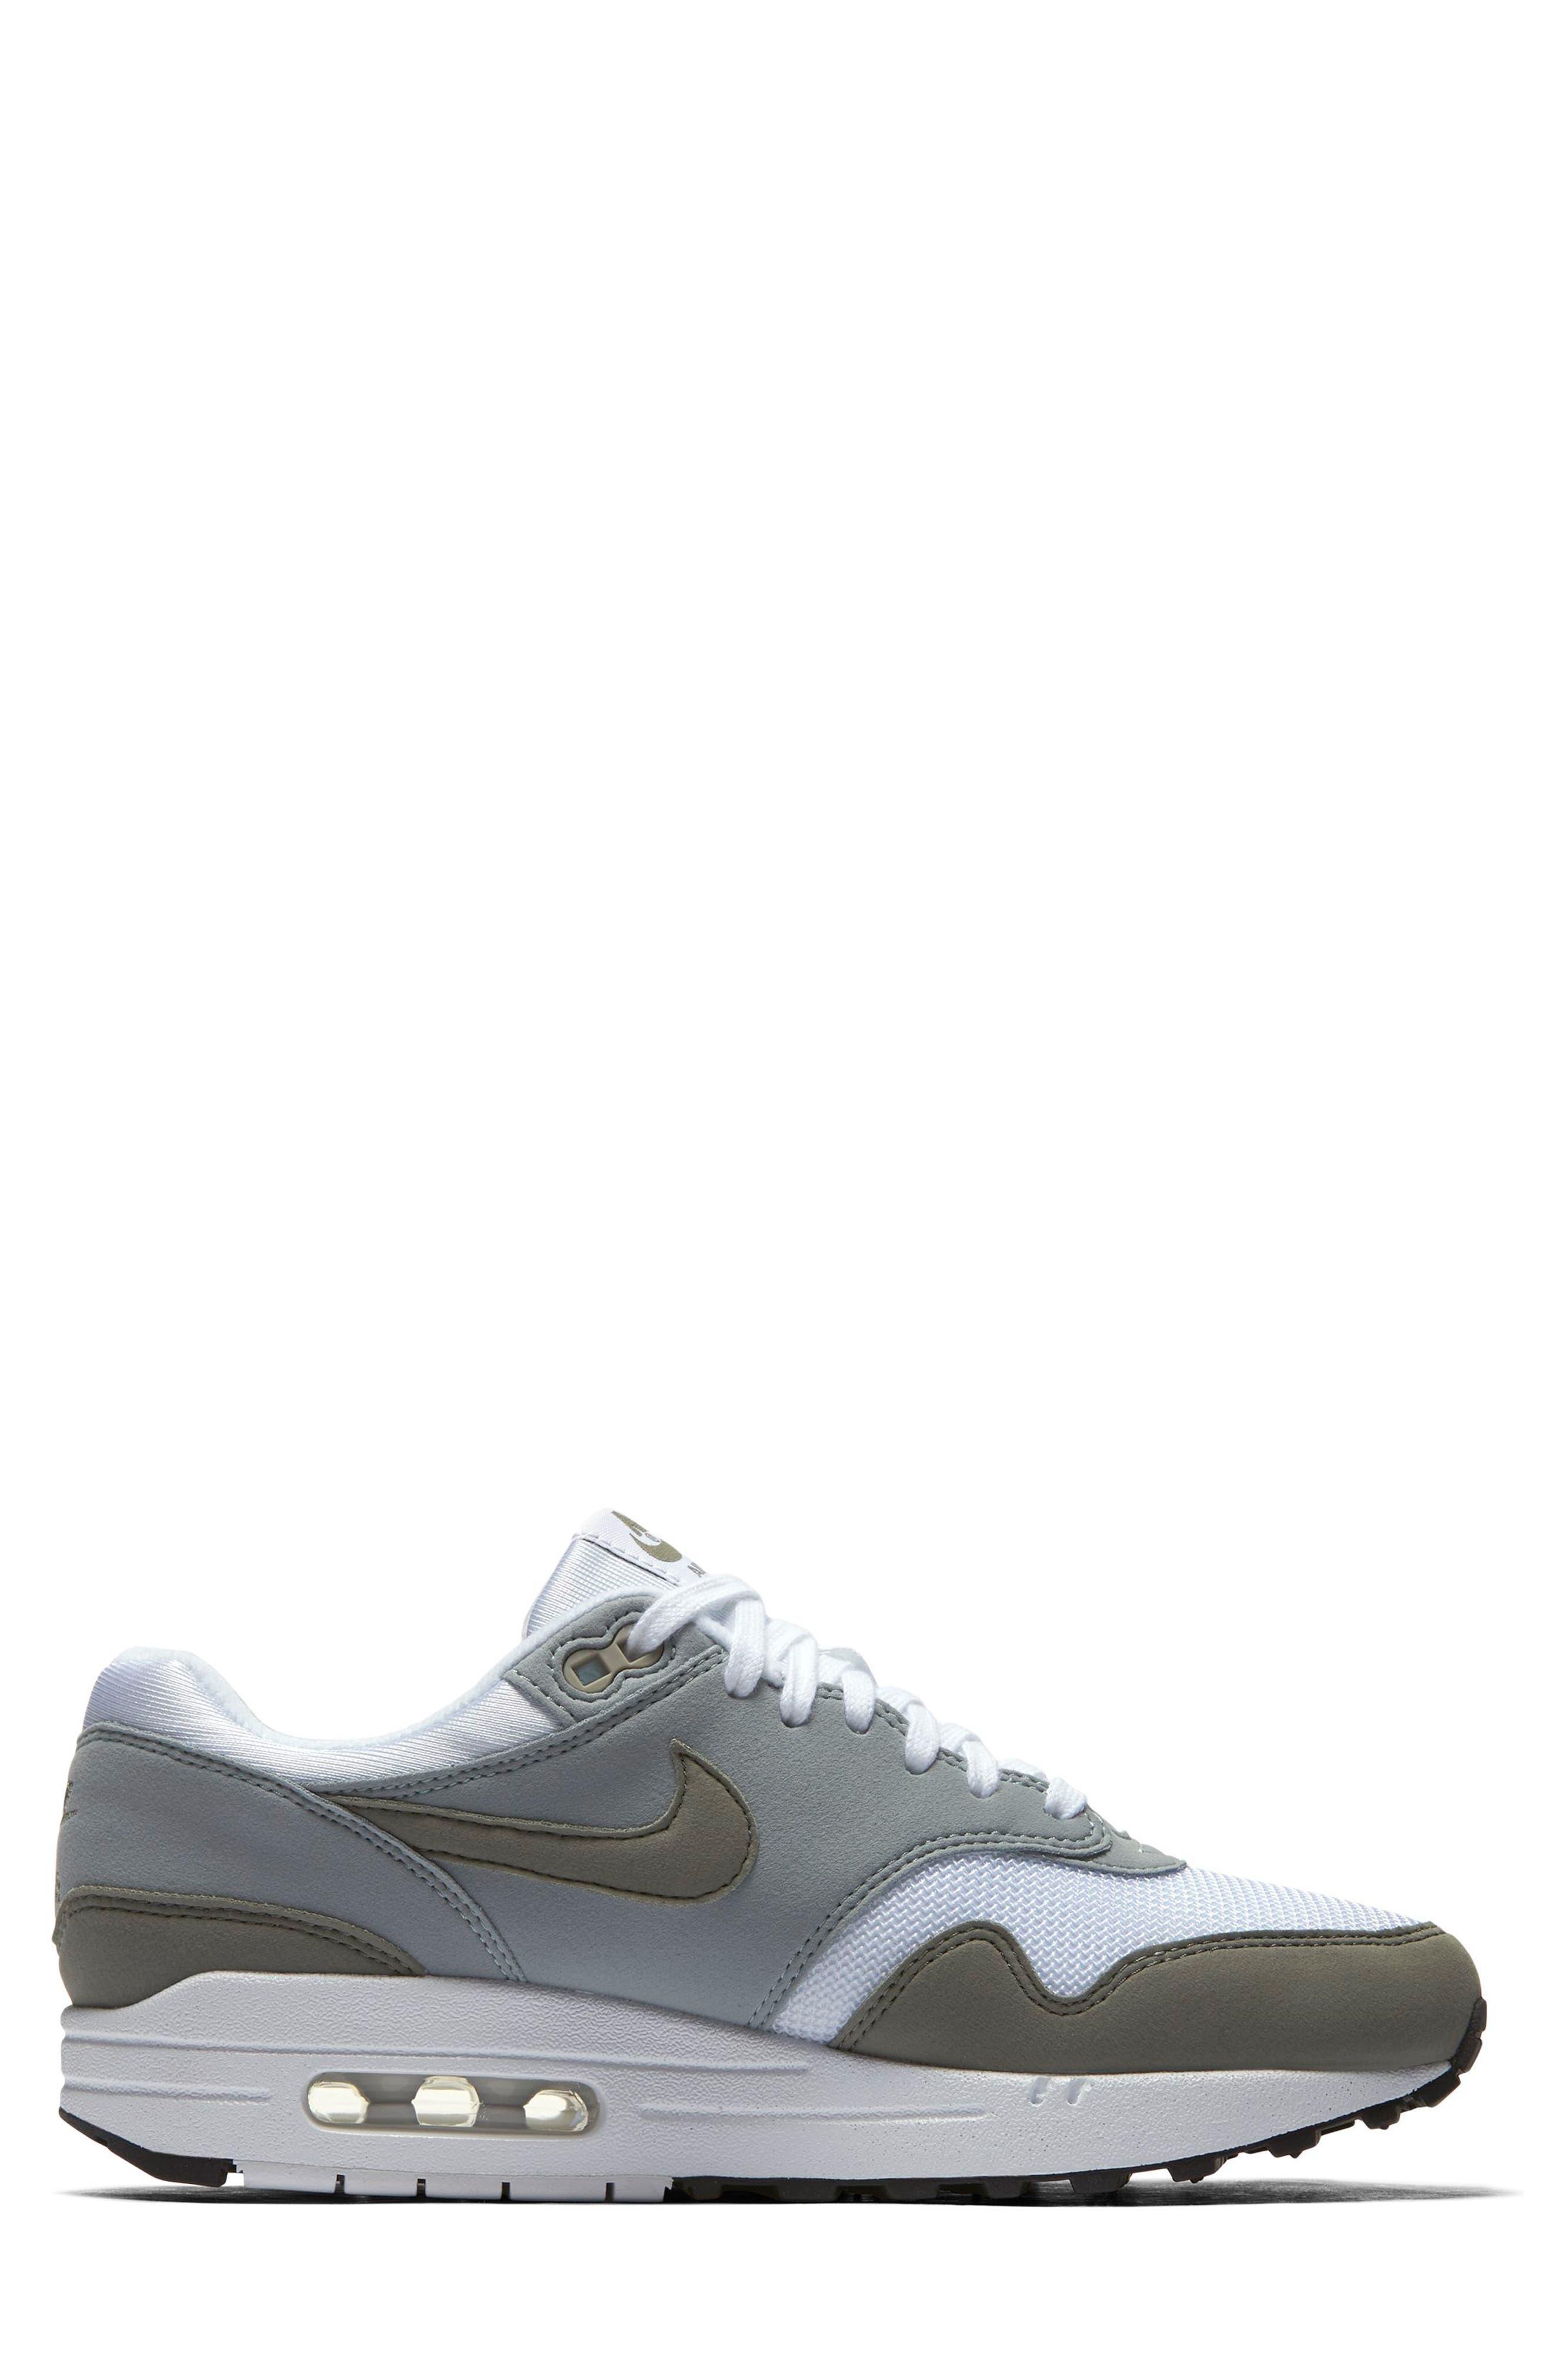 Air Max 1 Sneaker,                             Alternate thumbnail 3, color,                             White/ Dark Stucco